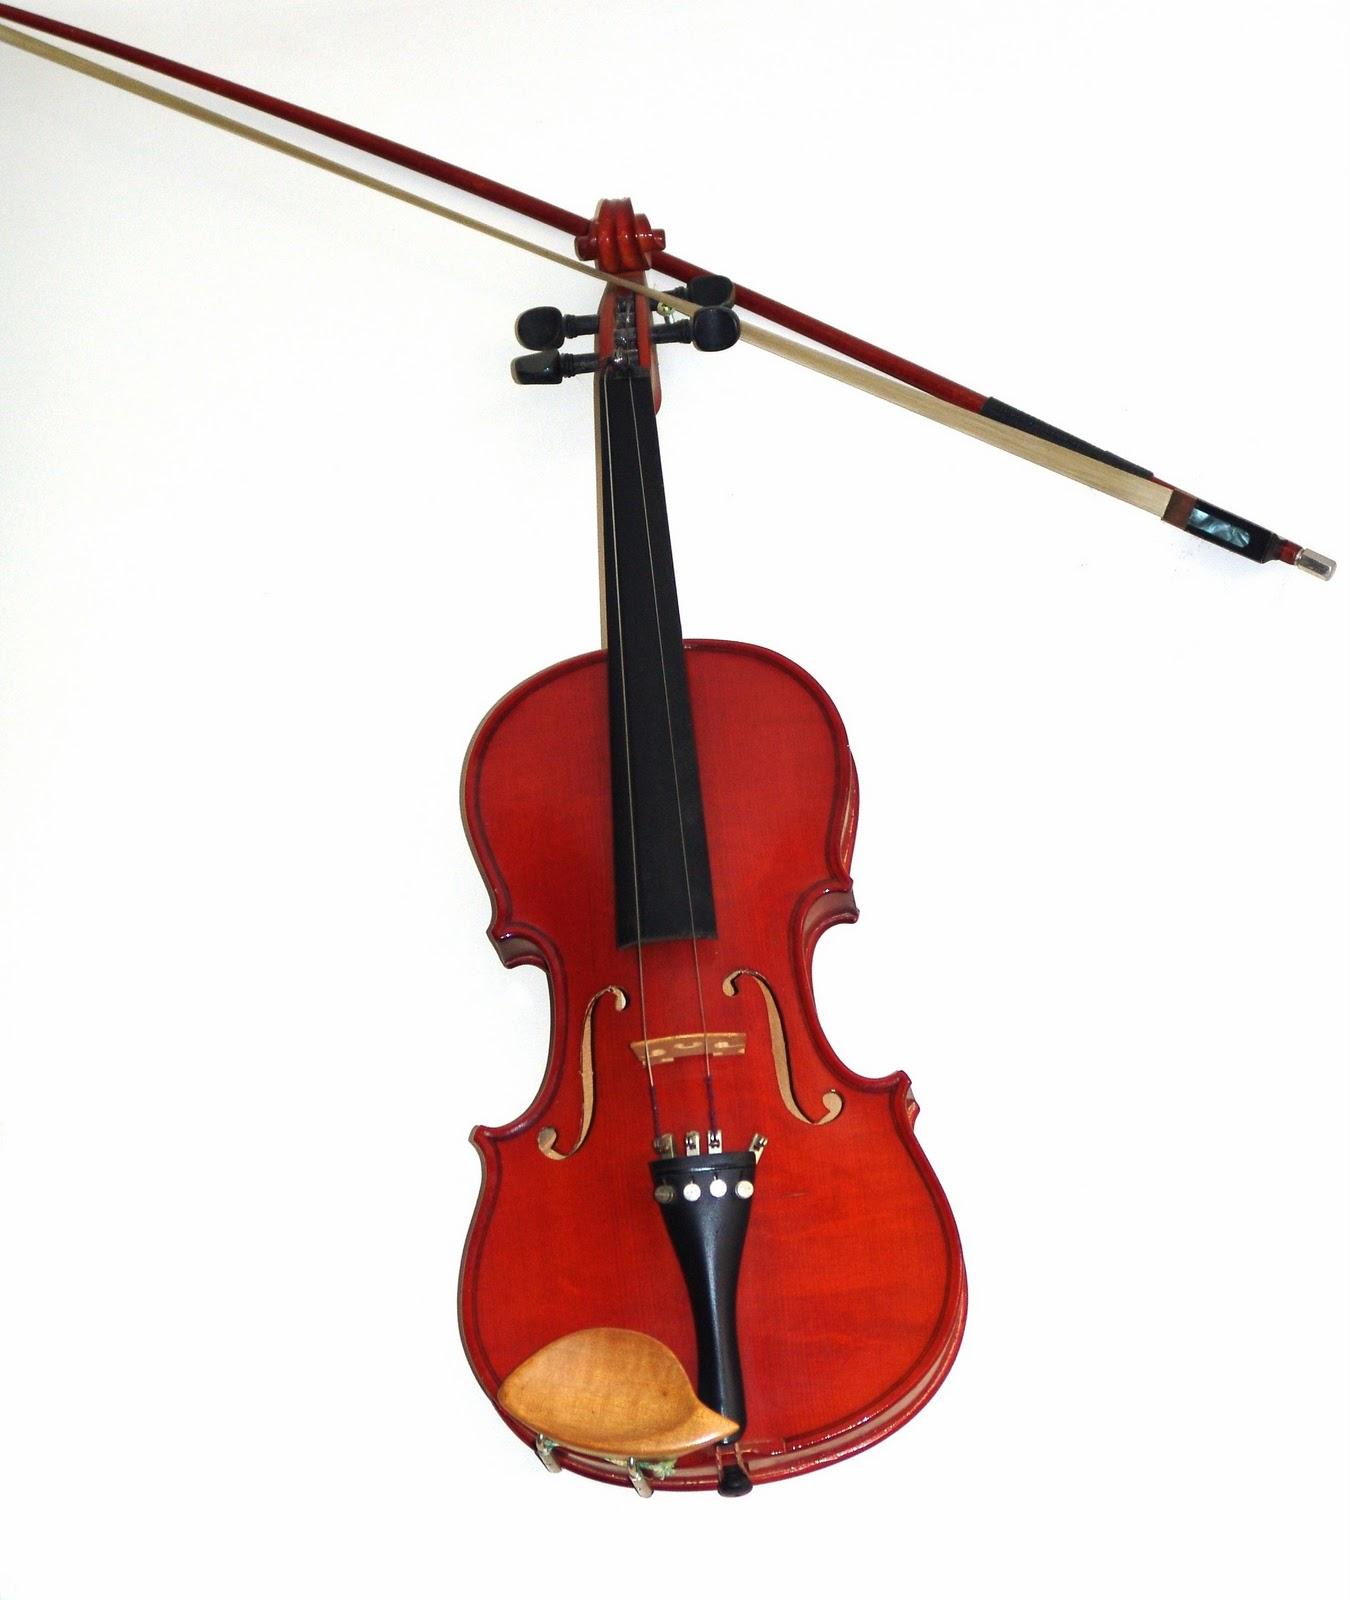 Violin Wallpaper: Amazing Violin Wallpaper